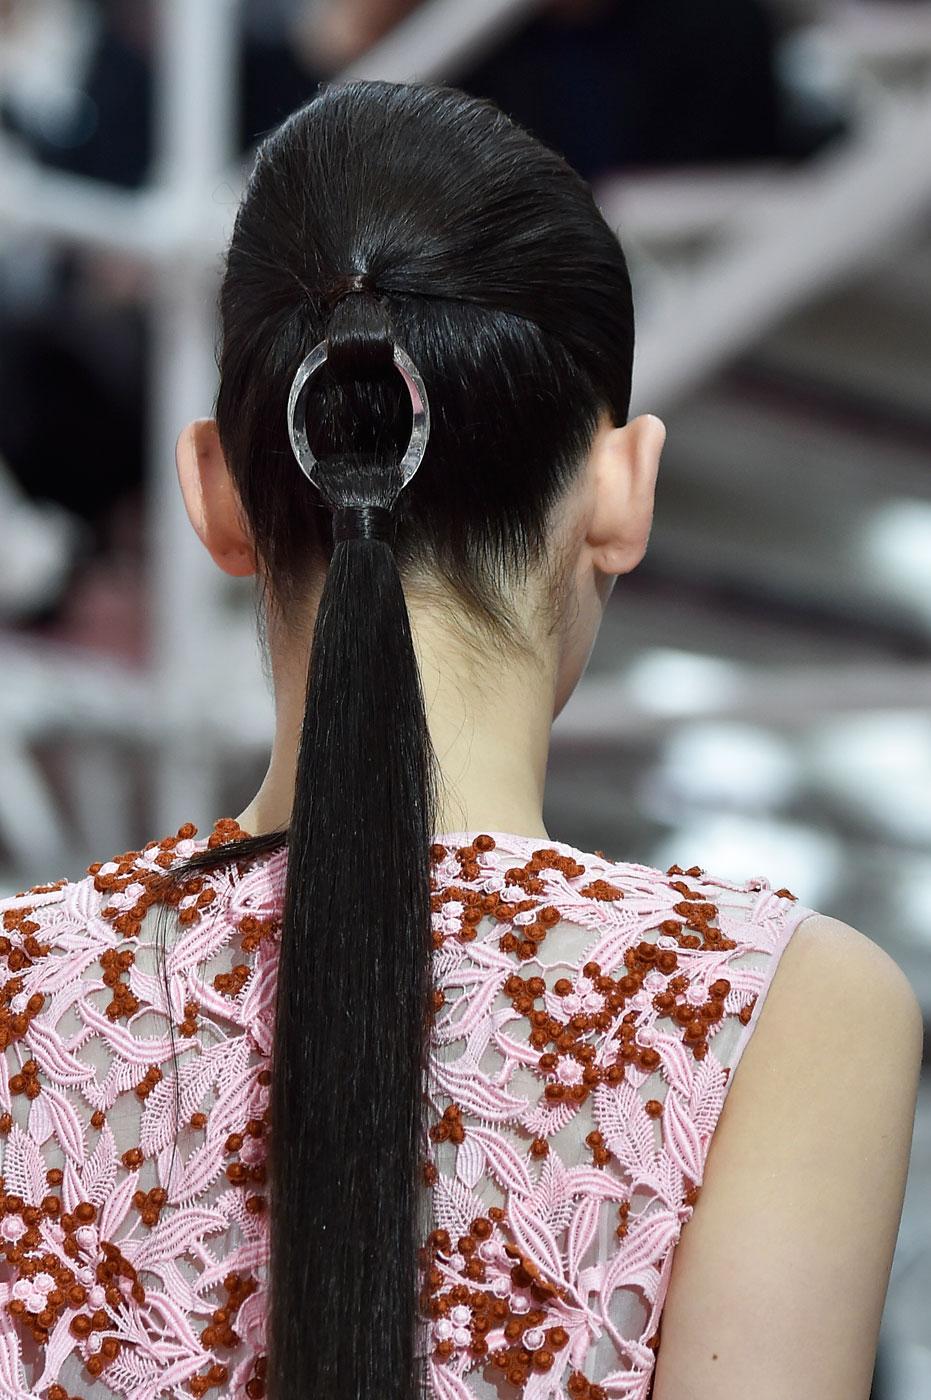 Christian-Dior-fashion-runway-show-close-ups-haute-couture-paris-spring-summer-2015-the-impression-062